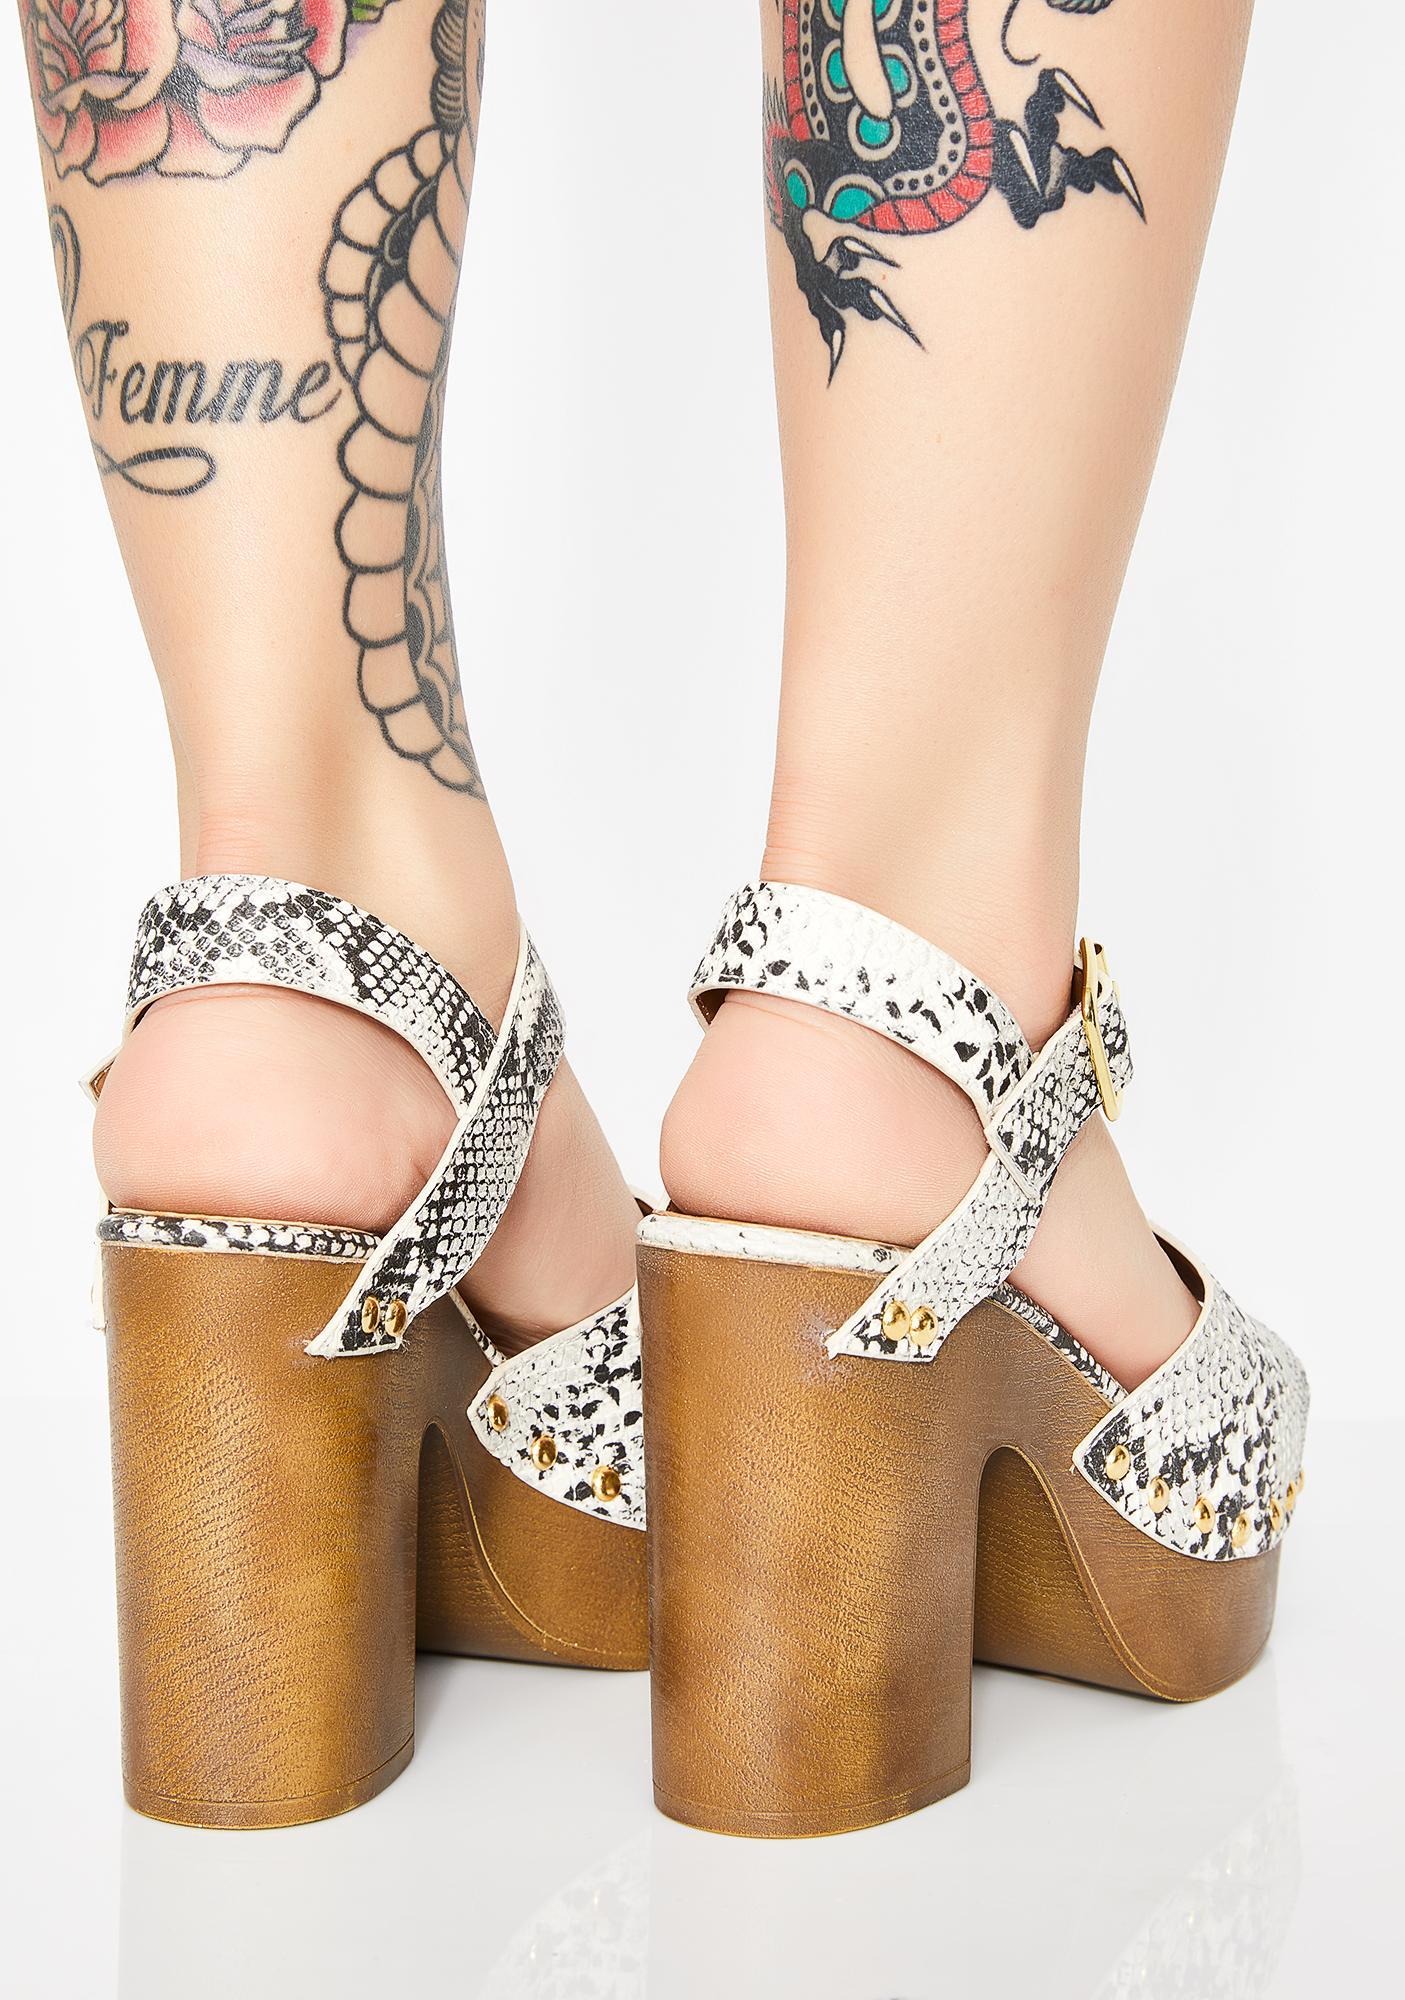 Vile Shady Ladies Platform Sandals